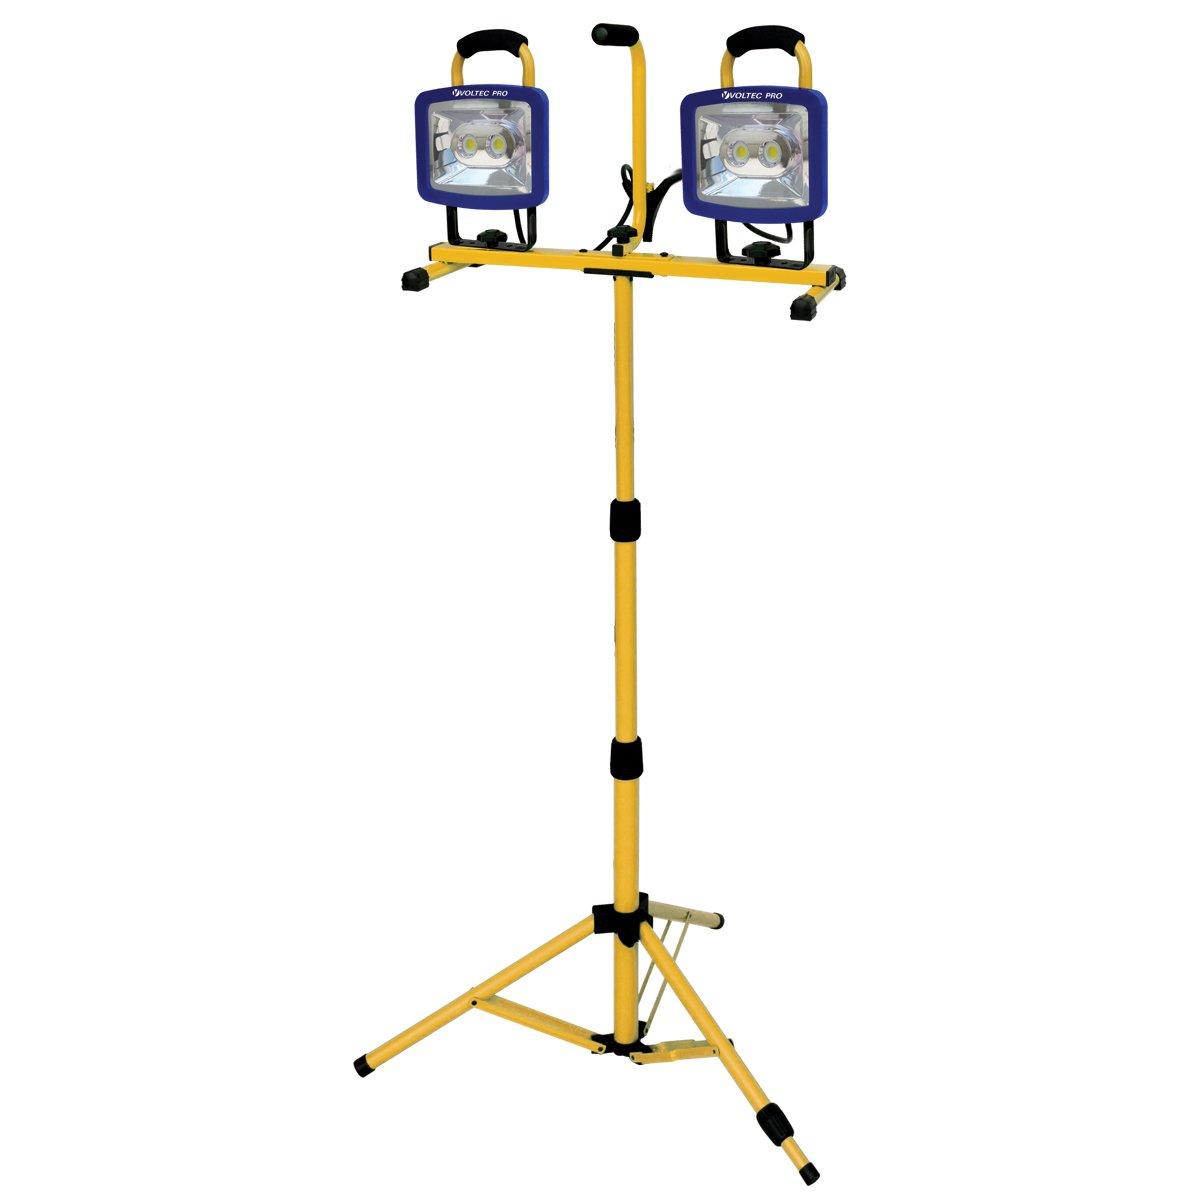 Voltec 08-00716 Dual 44 Watt Cob AC LED Work Light with Tri-Pod Stand, 8400 Lumens